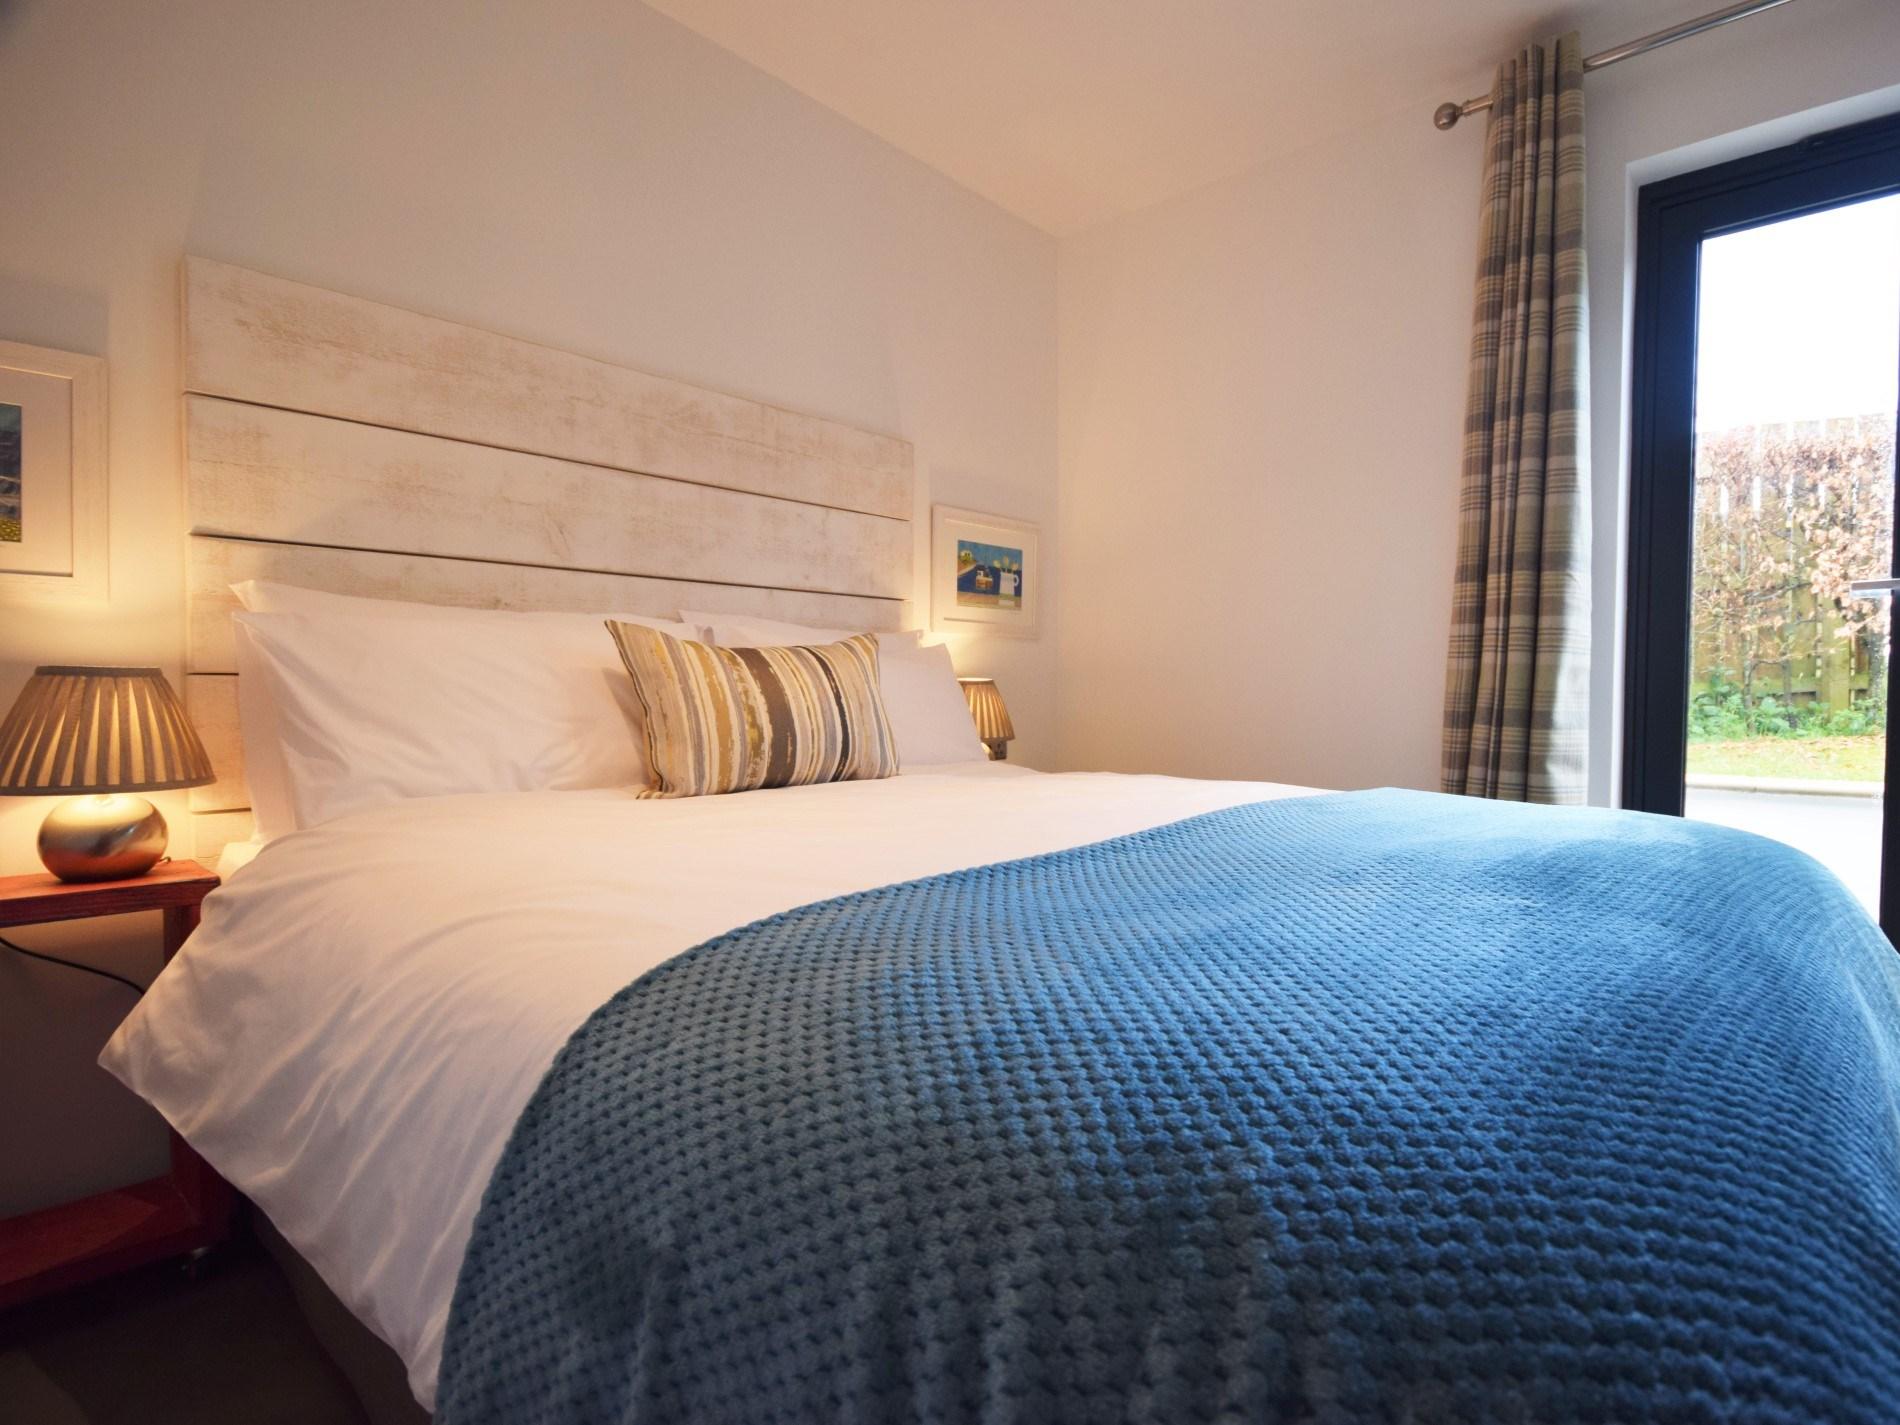 2 Bedroom Cottage in Holsworthy, Devon